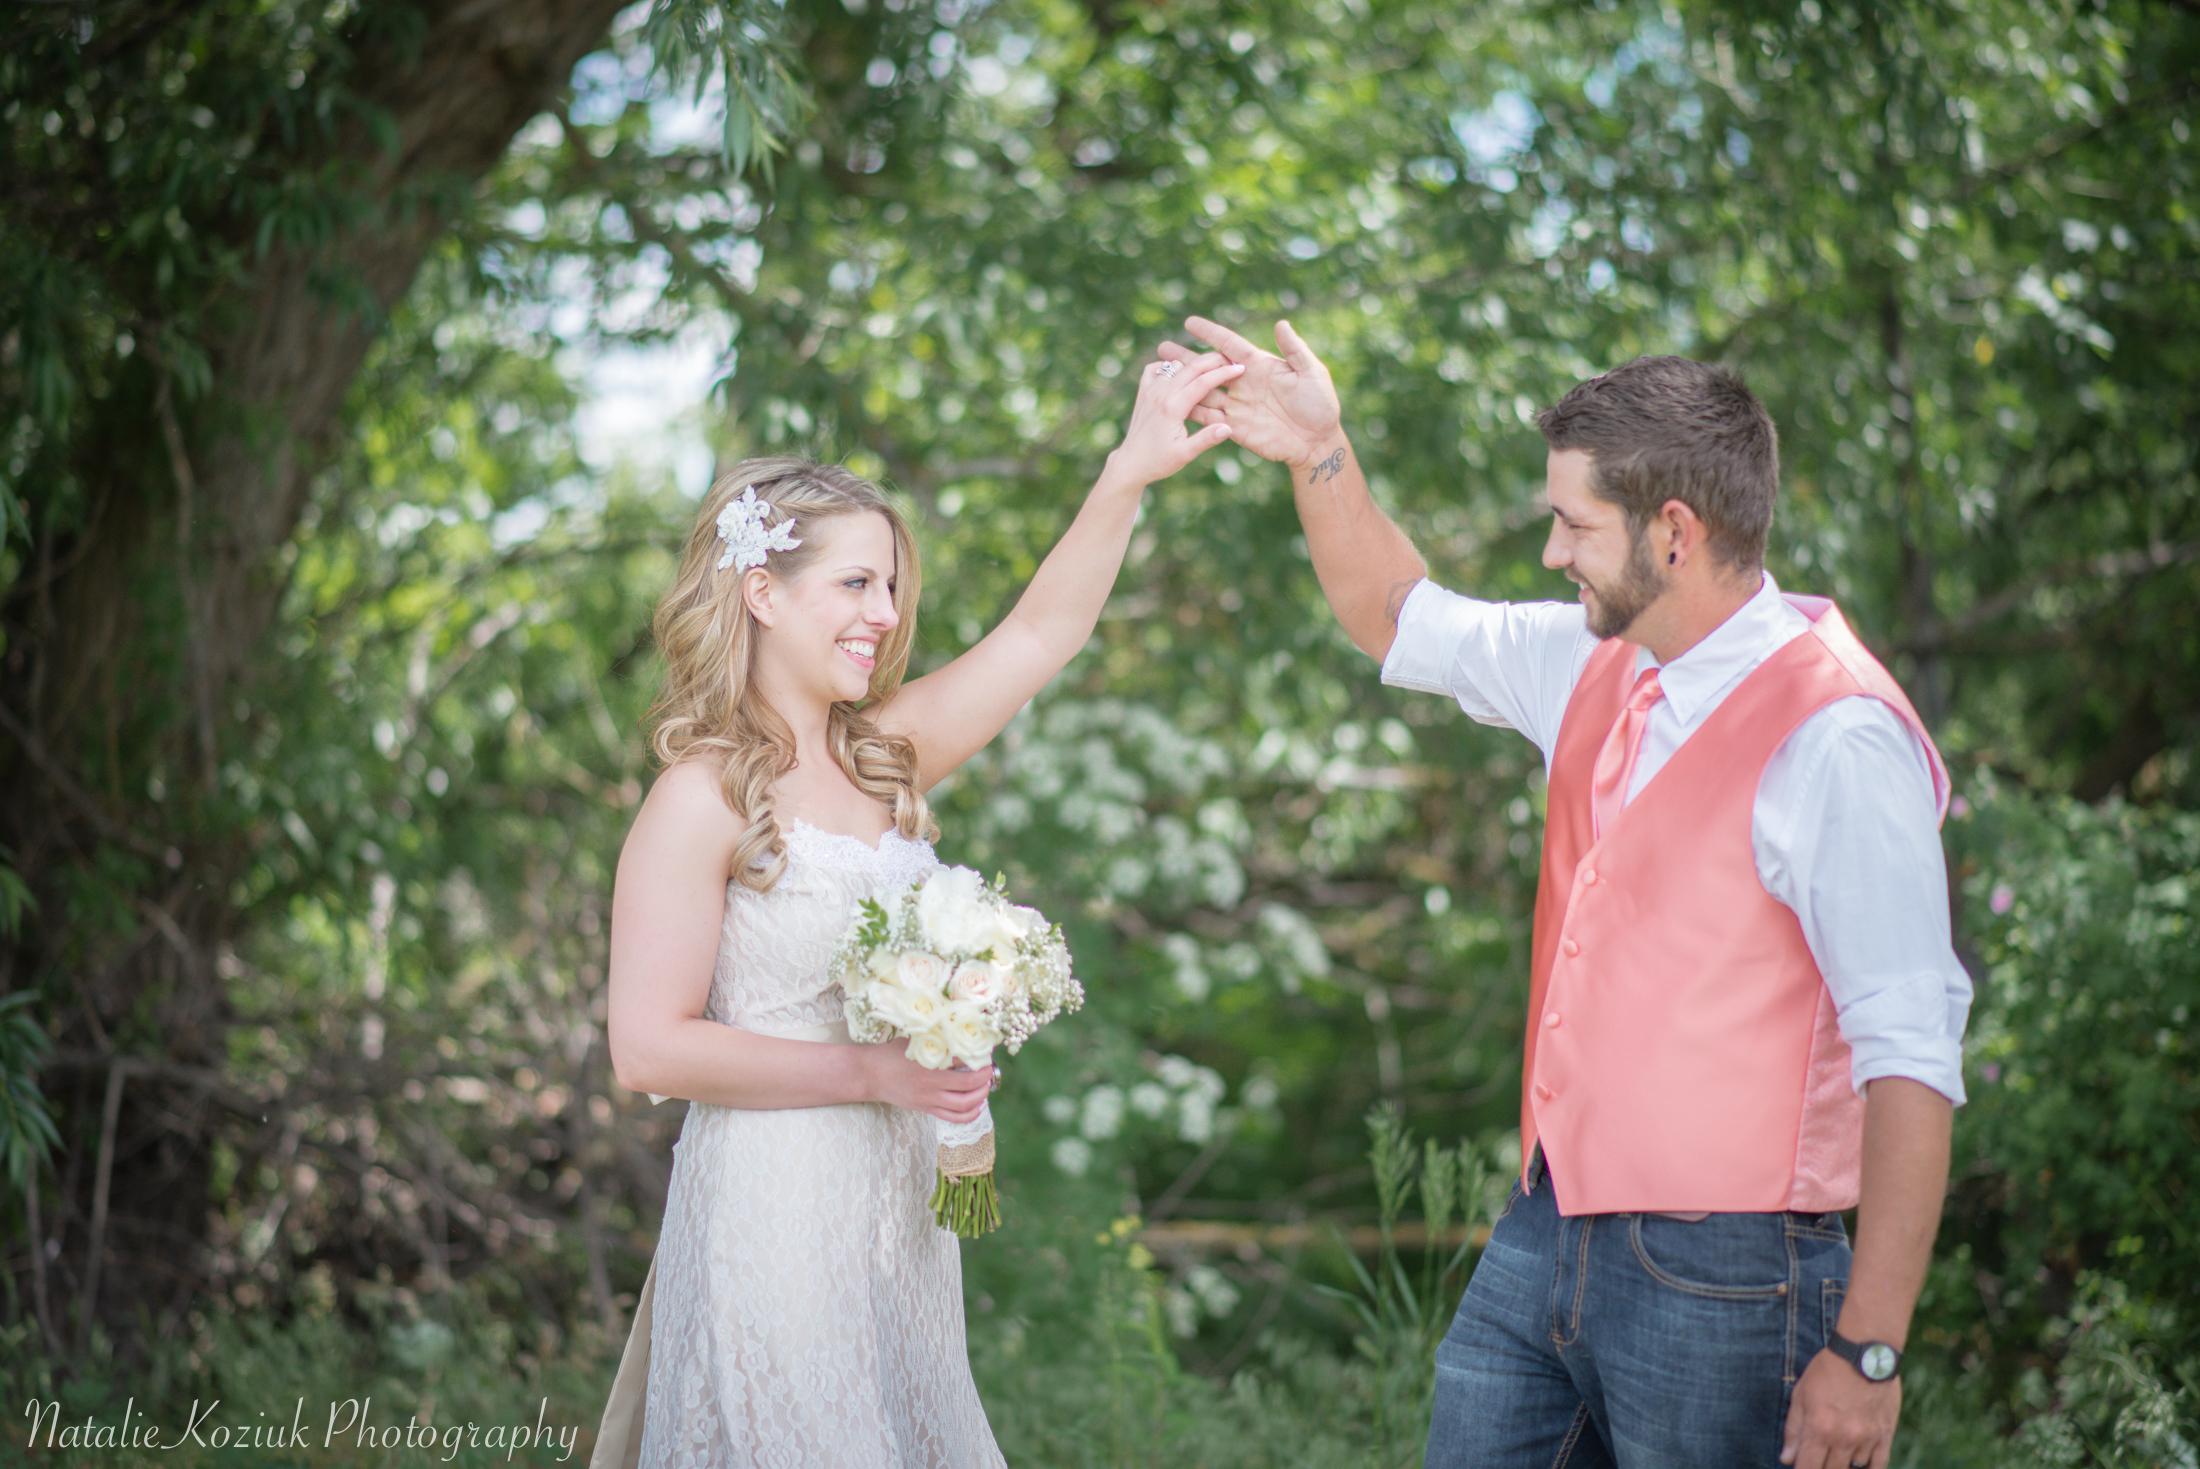 Natalie Koziuk Photography | Boise wedding photographer | couples | Star, ID | Bride Groom | nkoziukphotography.com